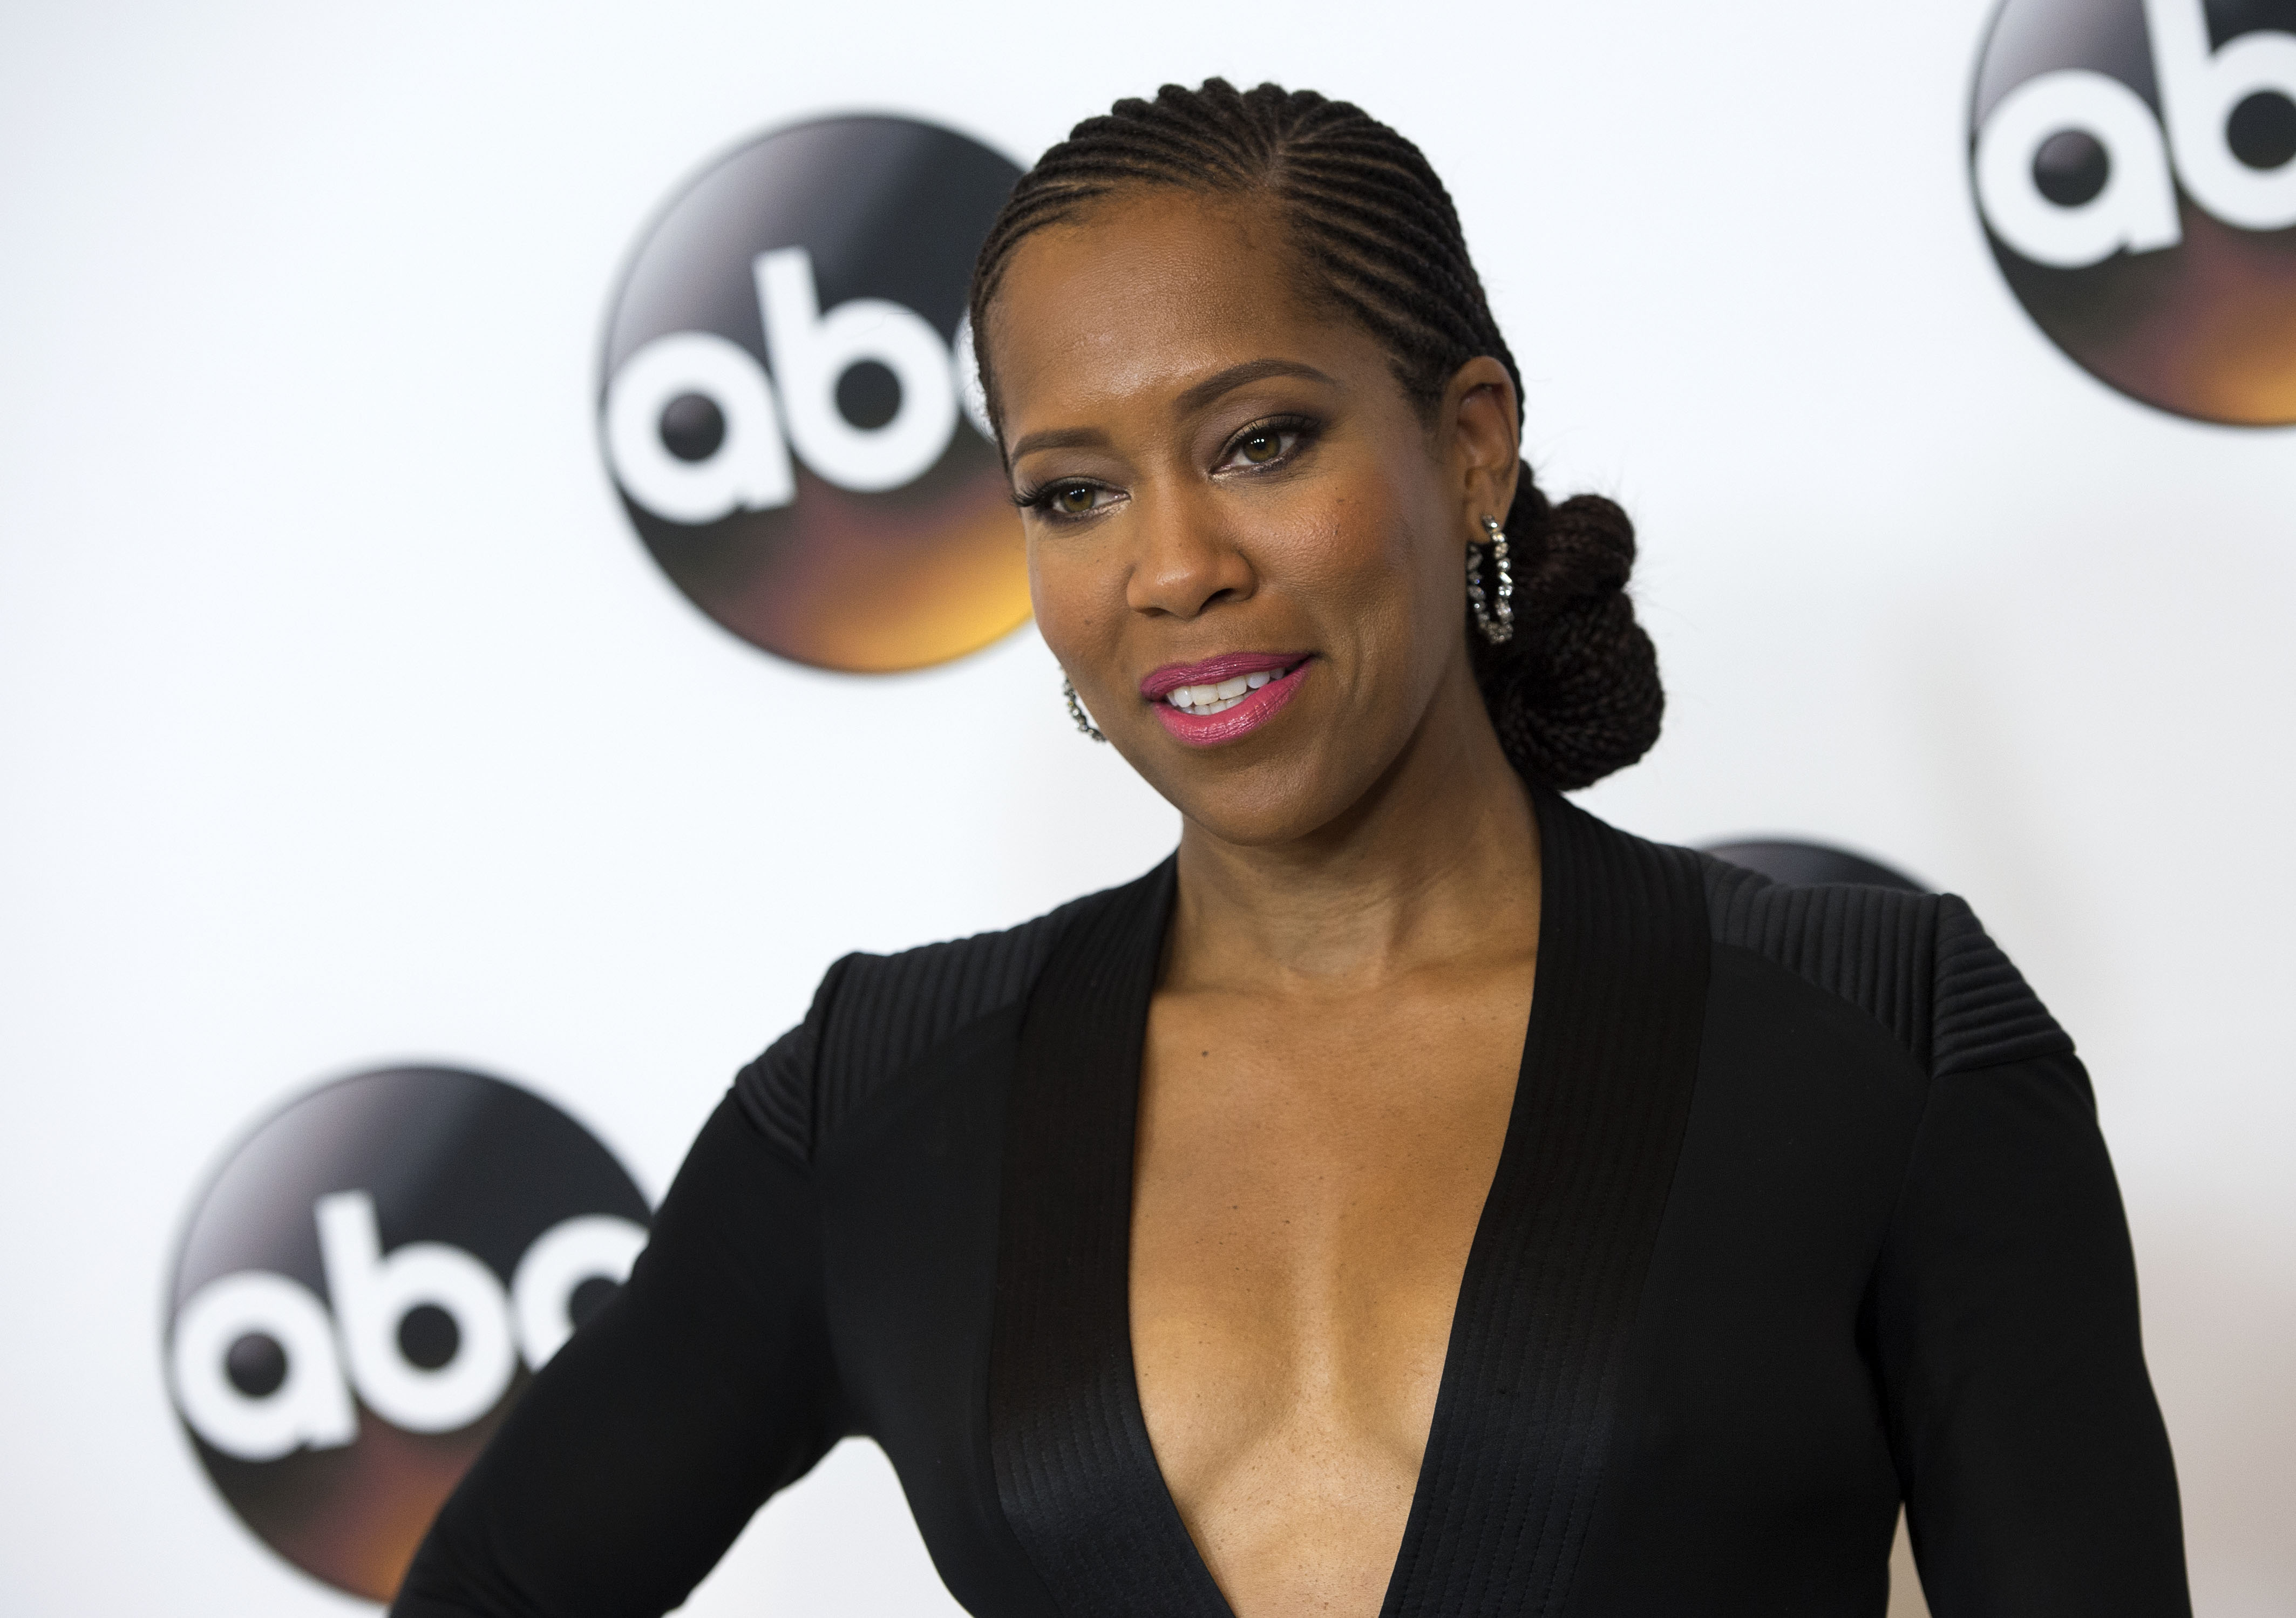 More black women dating outside race